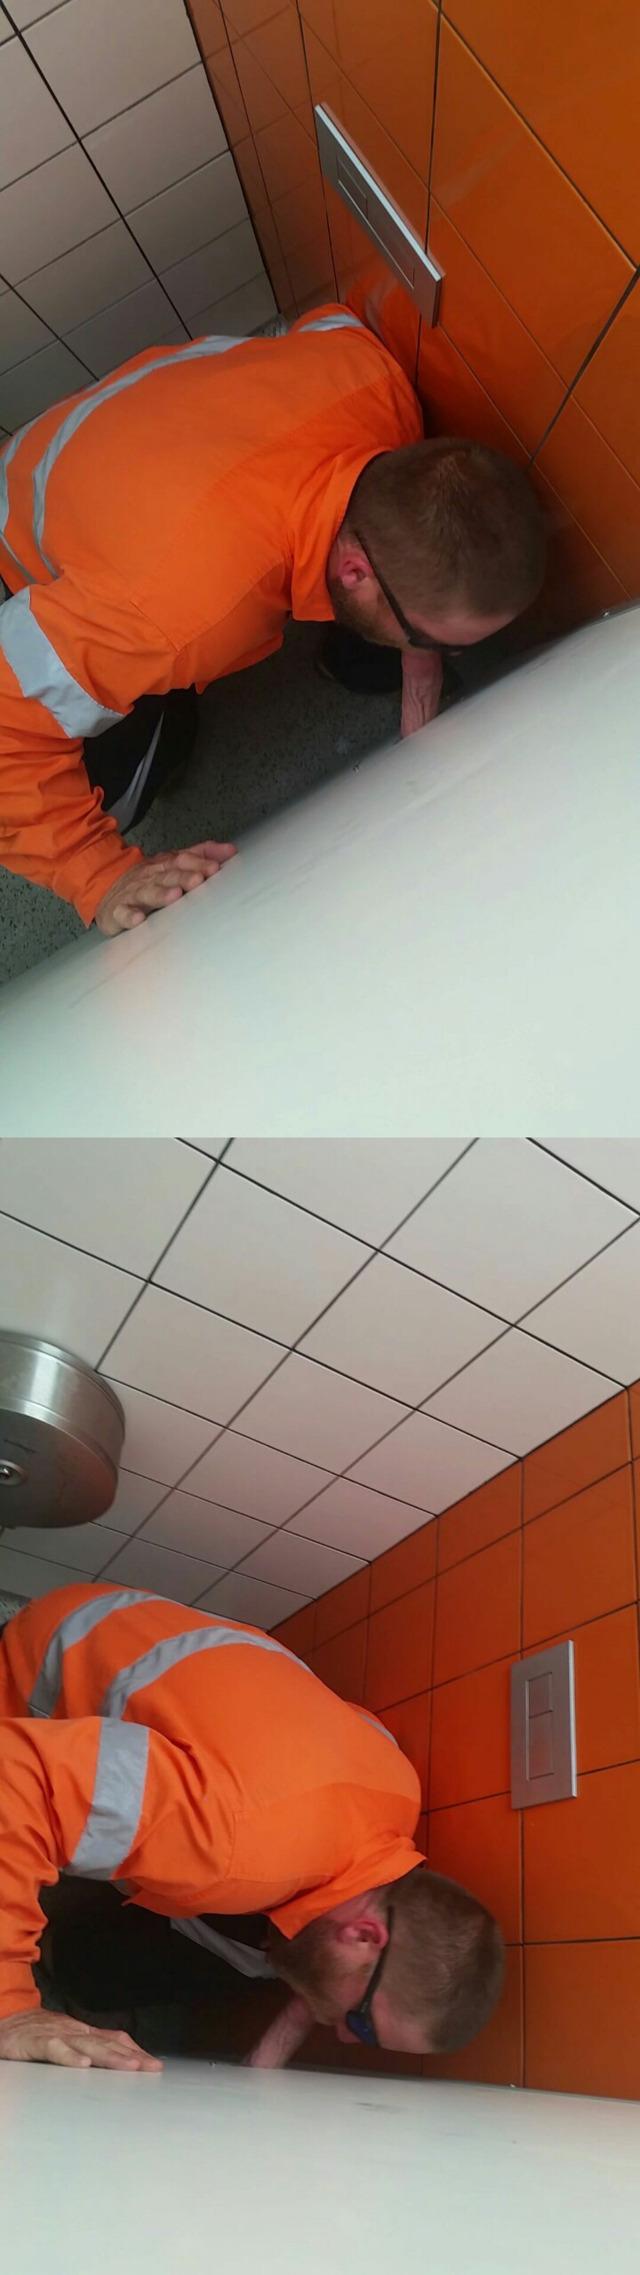 Realistic hidden glory hole web cams